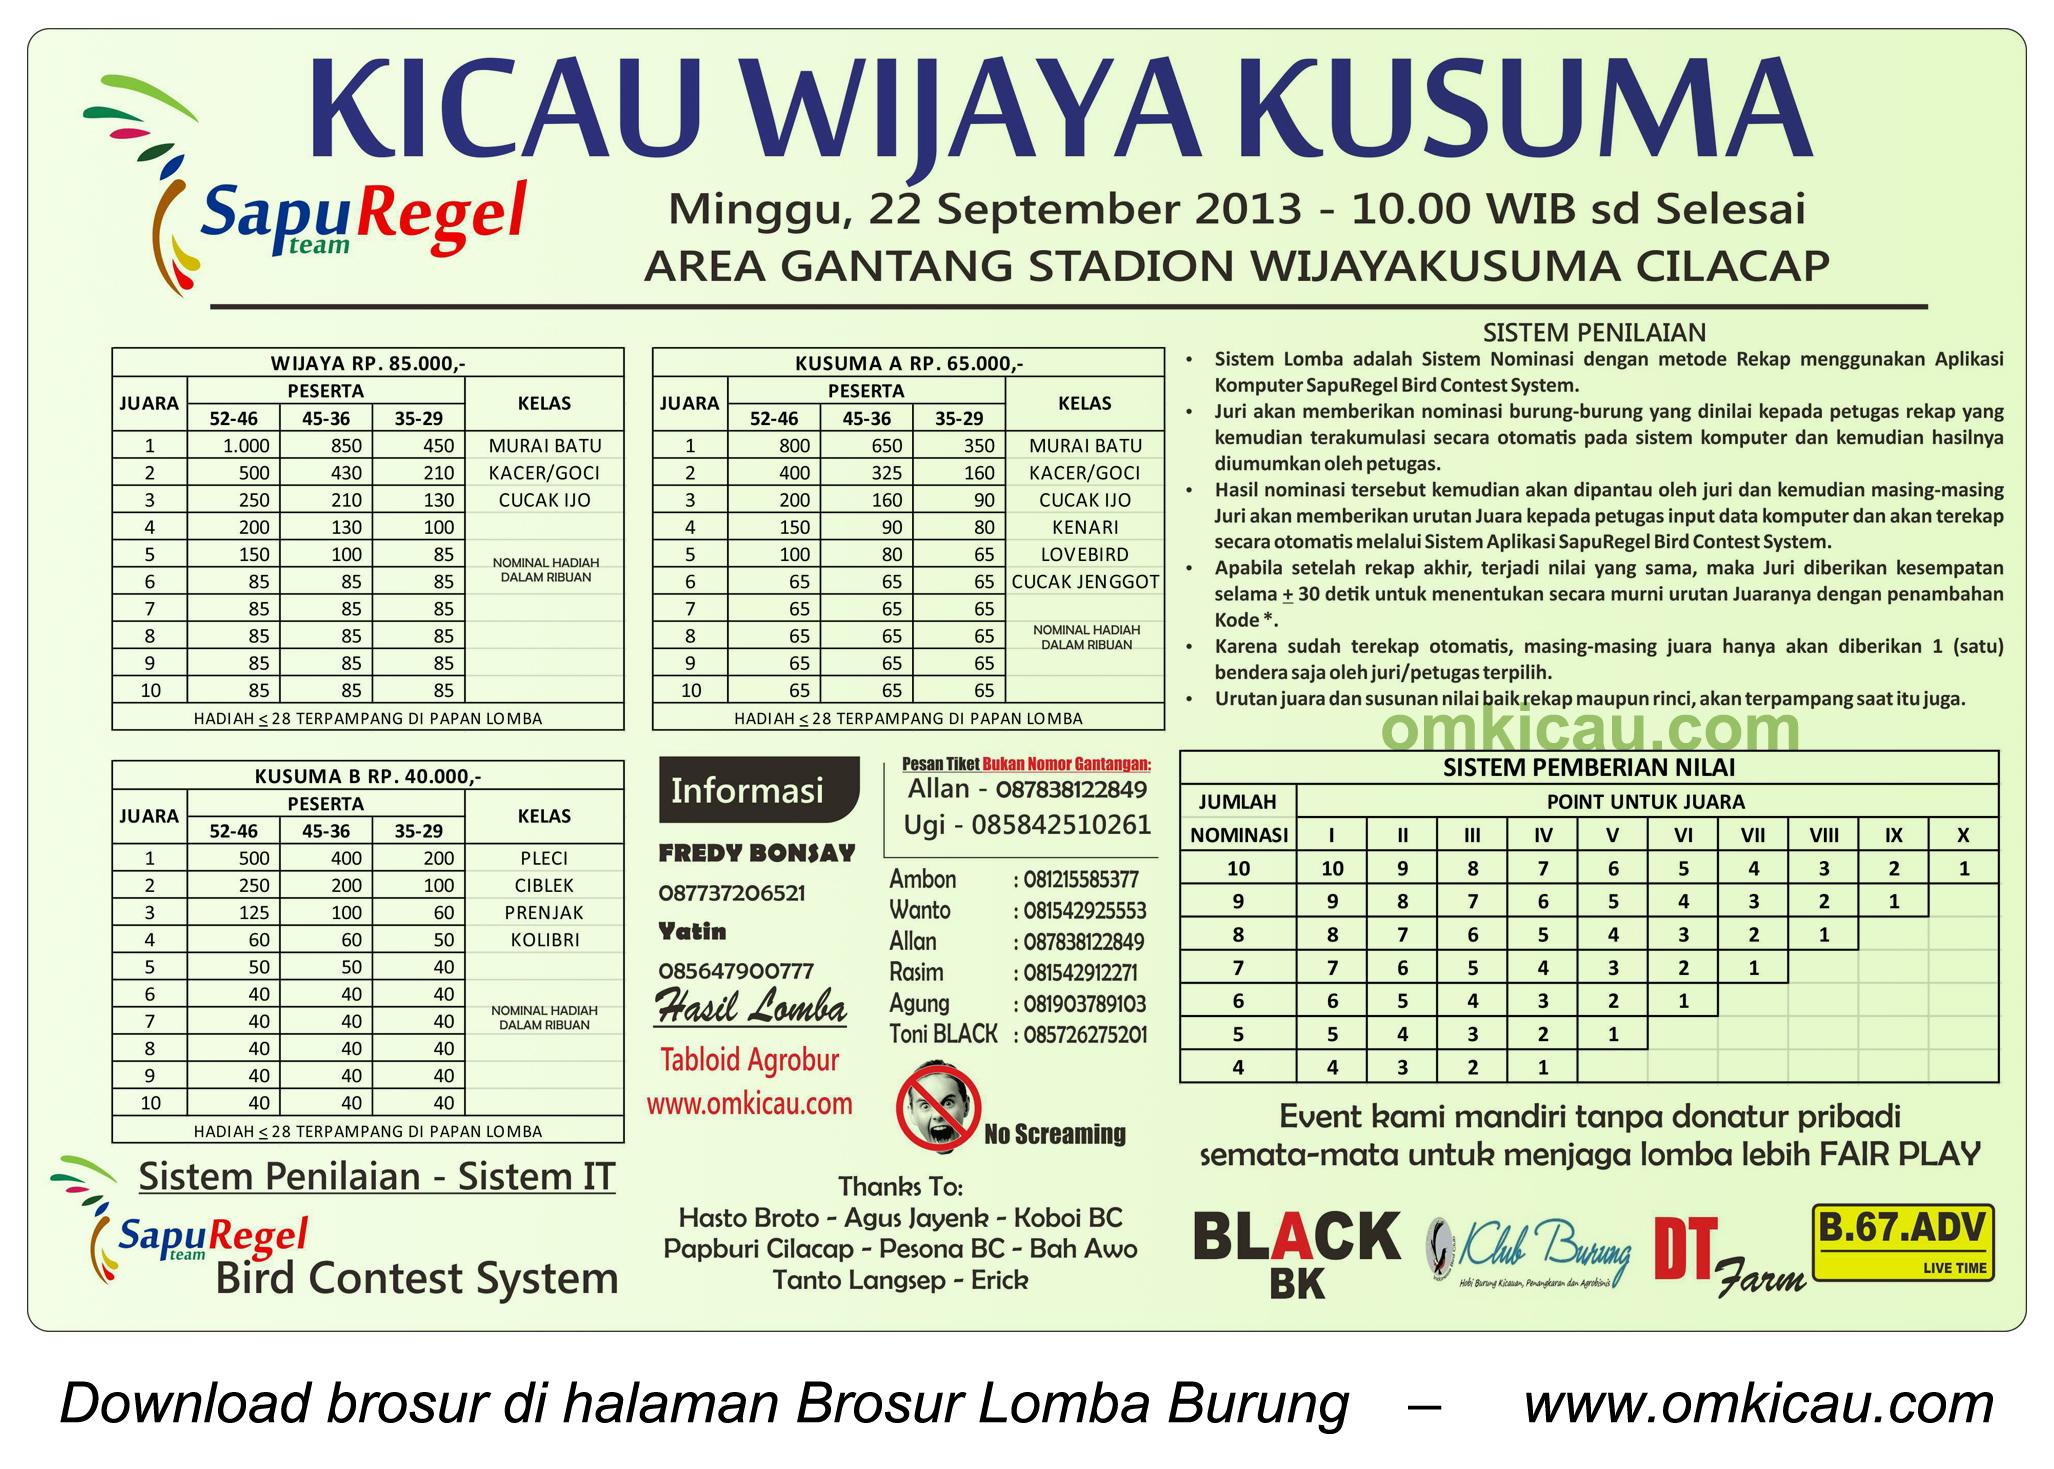 Brosur Lomba Burung Kicau Wijaya Kusuma - SapuRegel - Cilacap - 22 September 2013